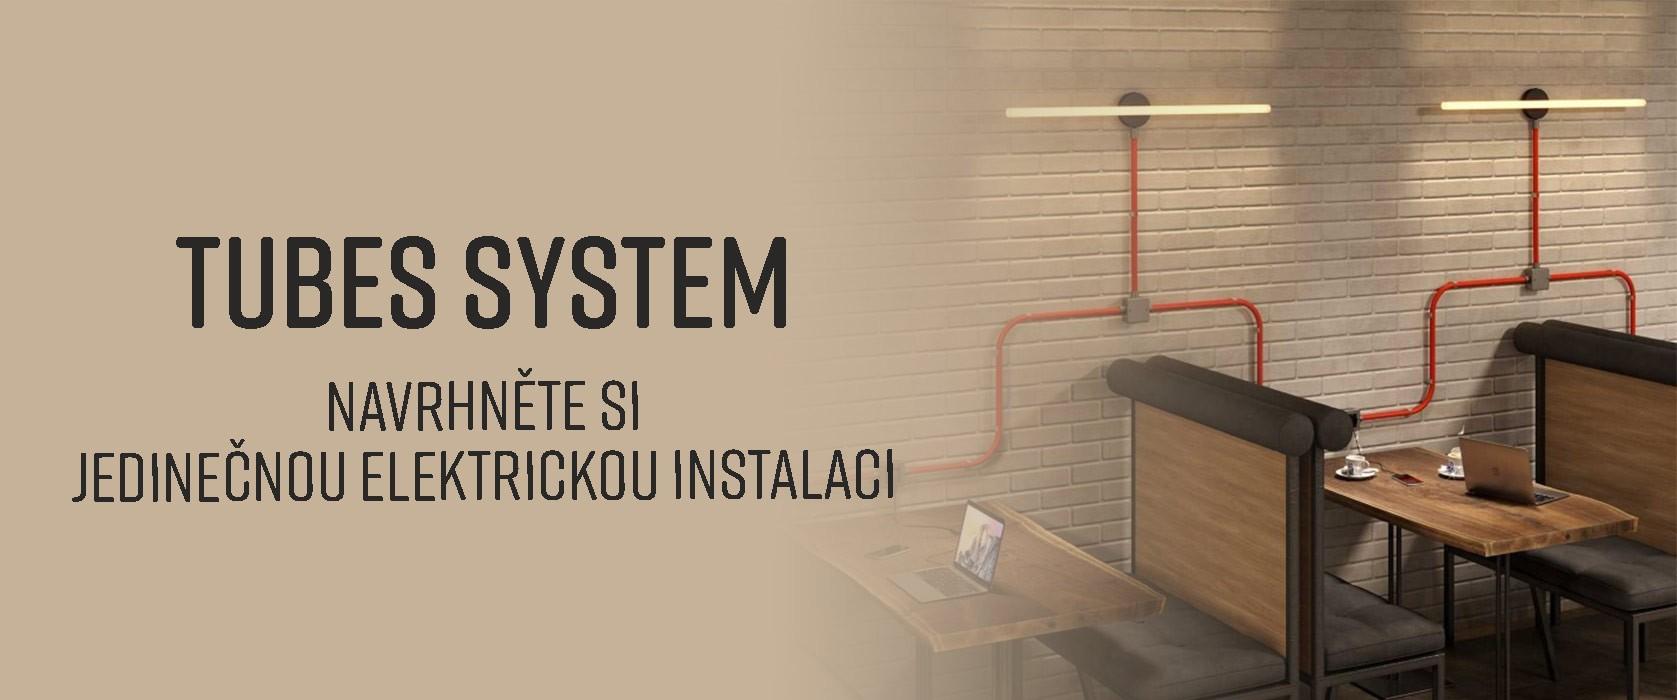 Tubes System